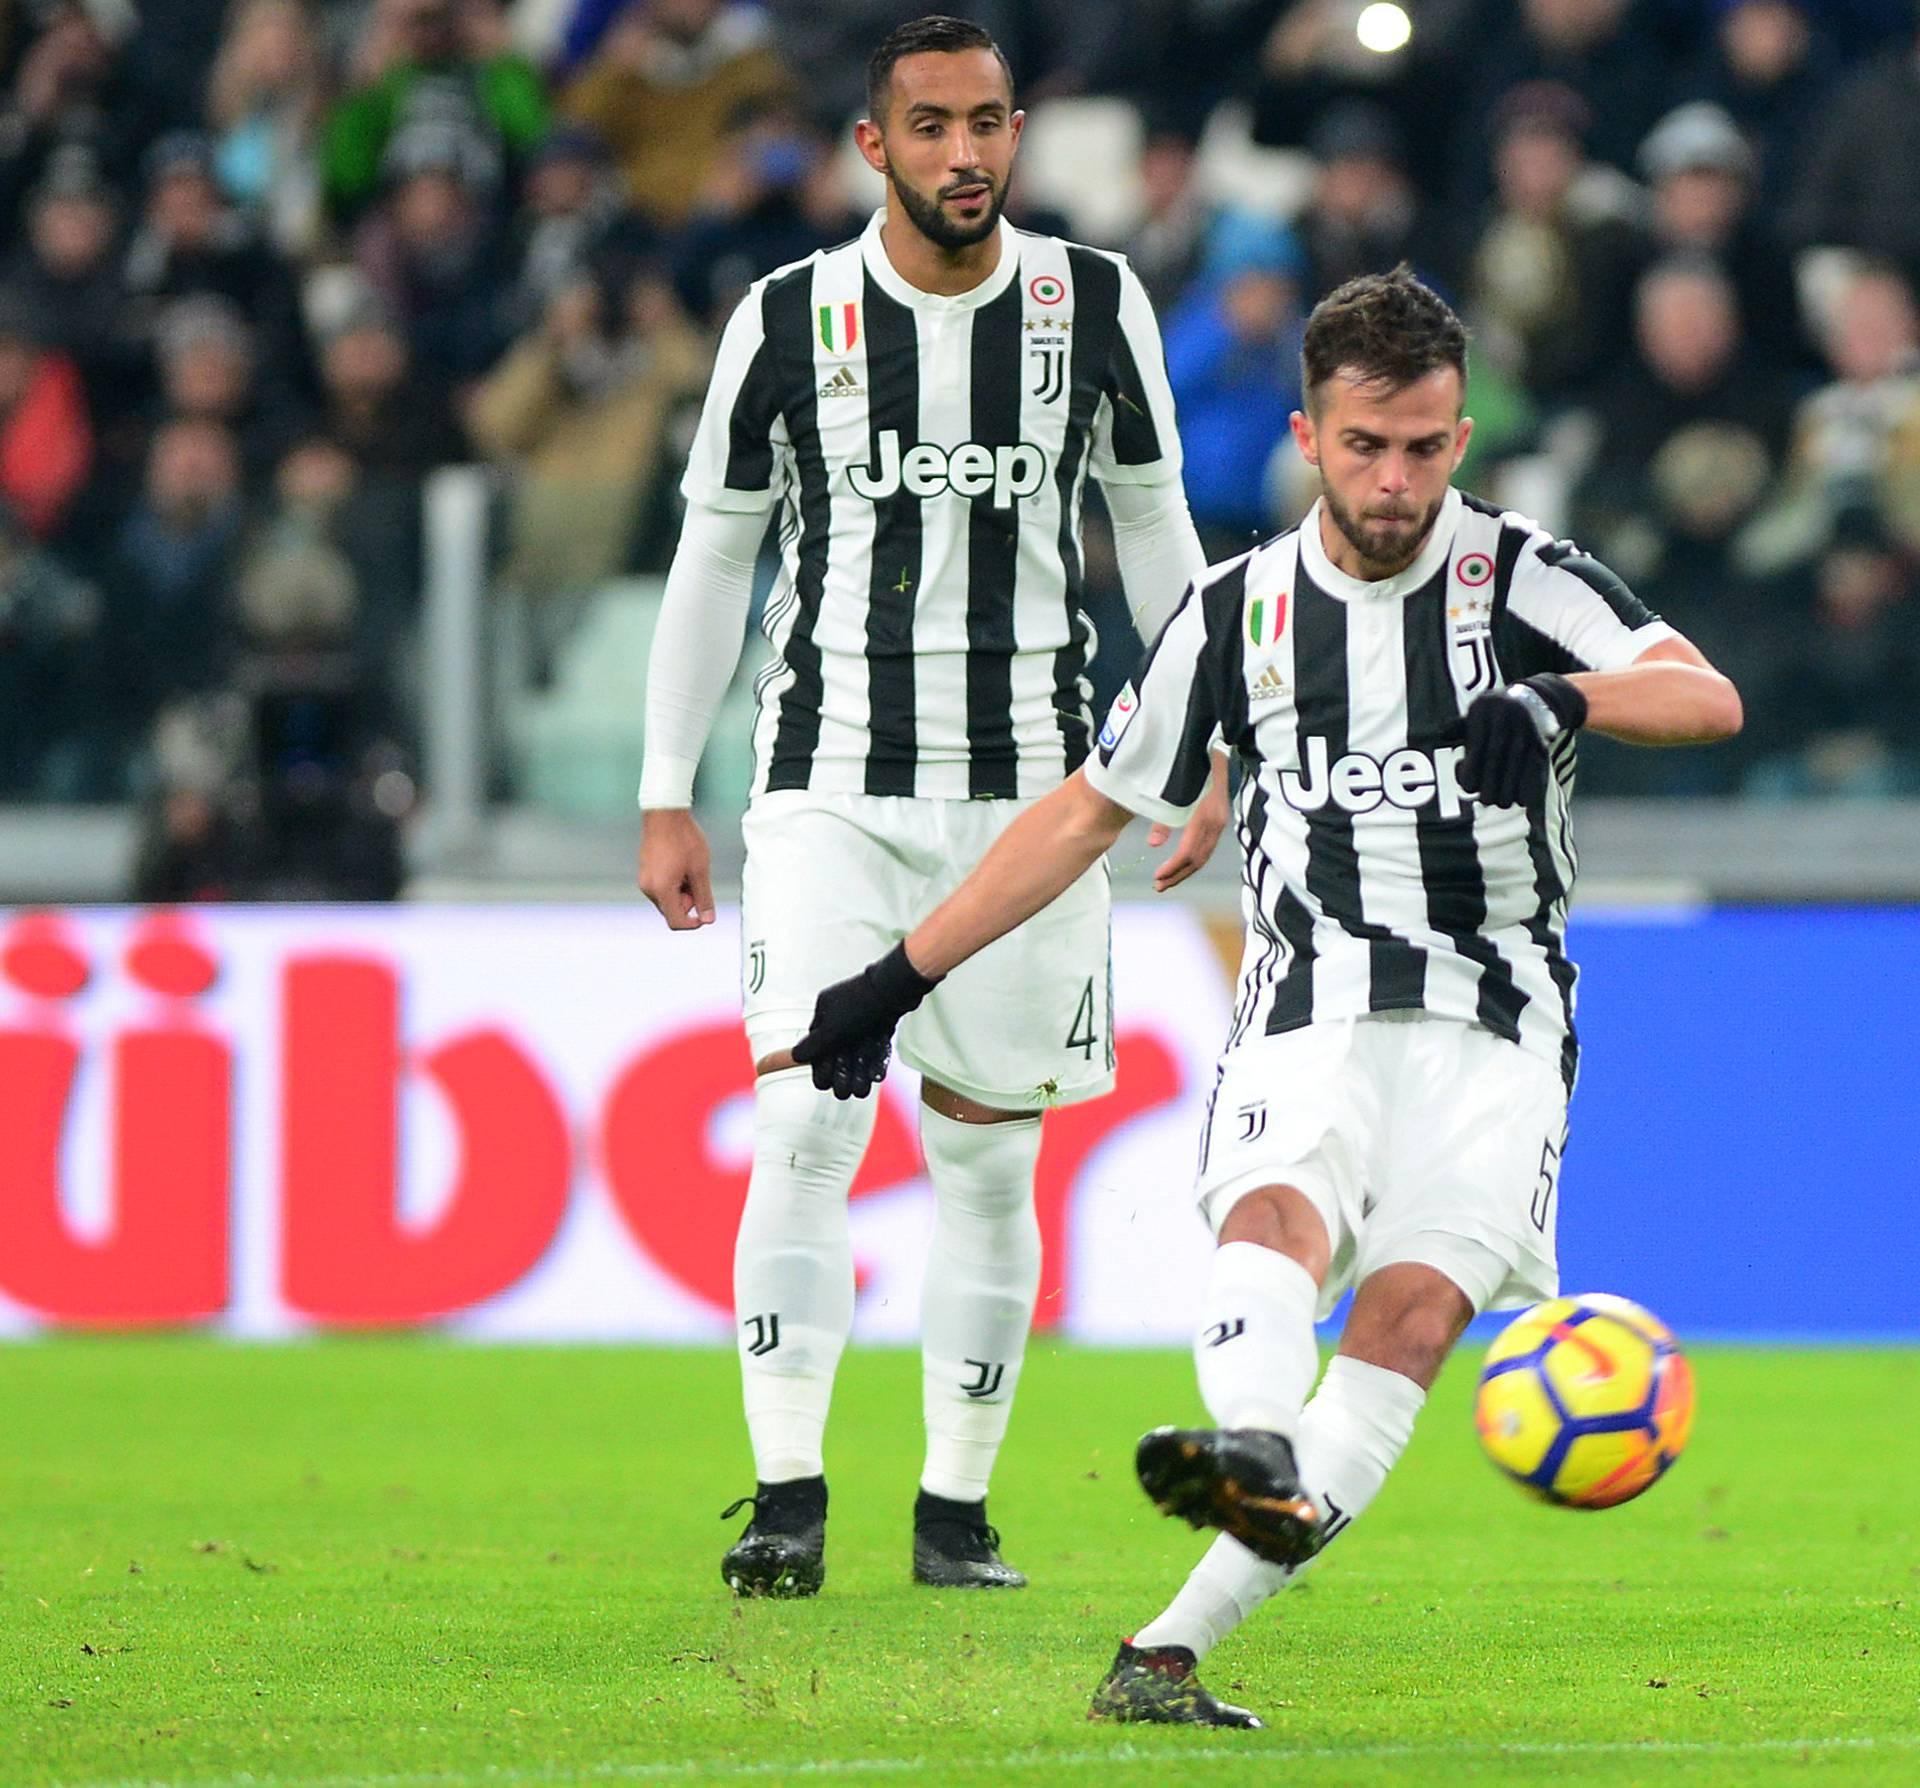 Serie A - Juventus vs Genoa